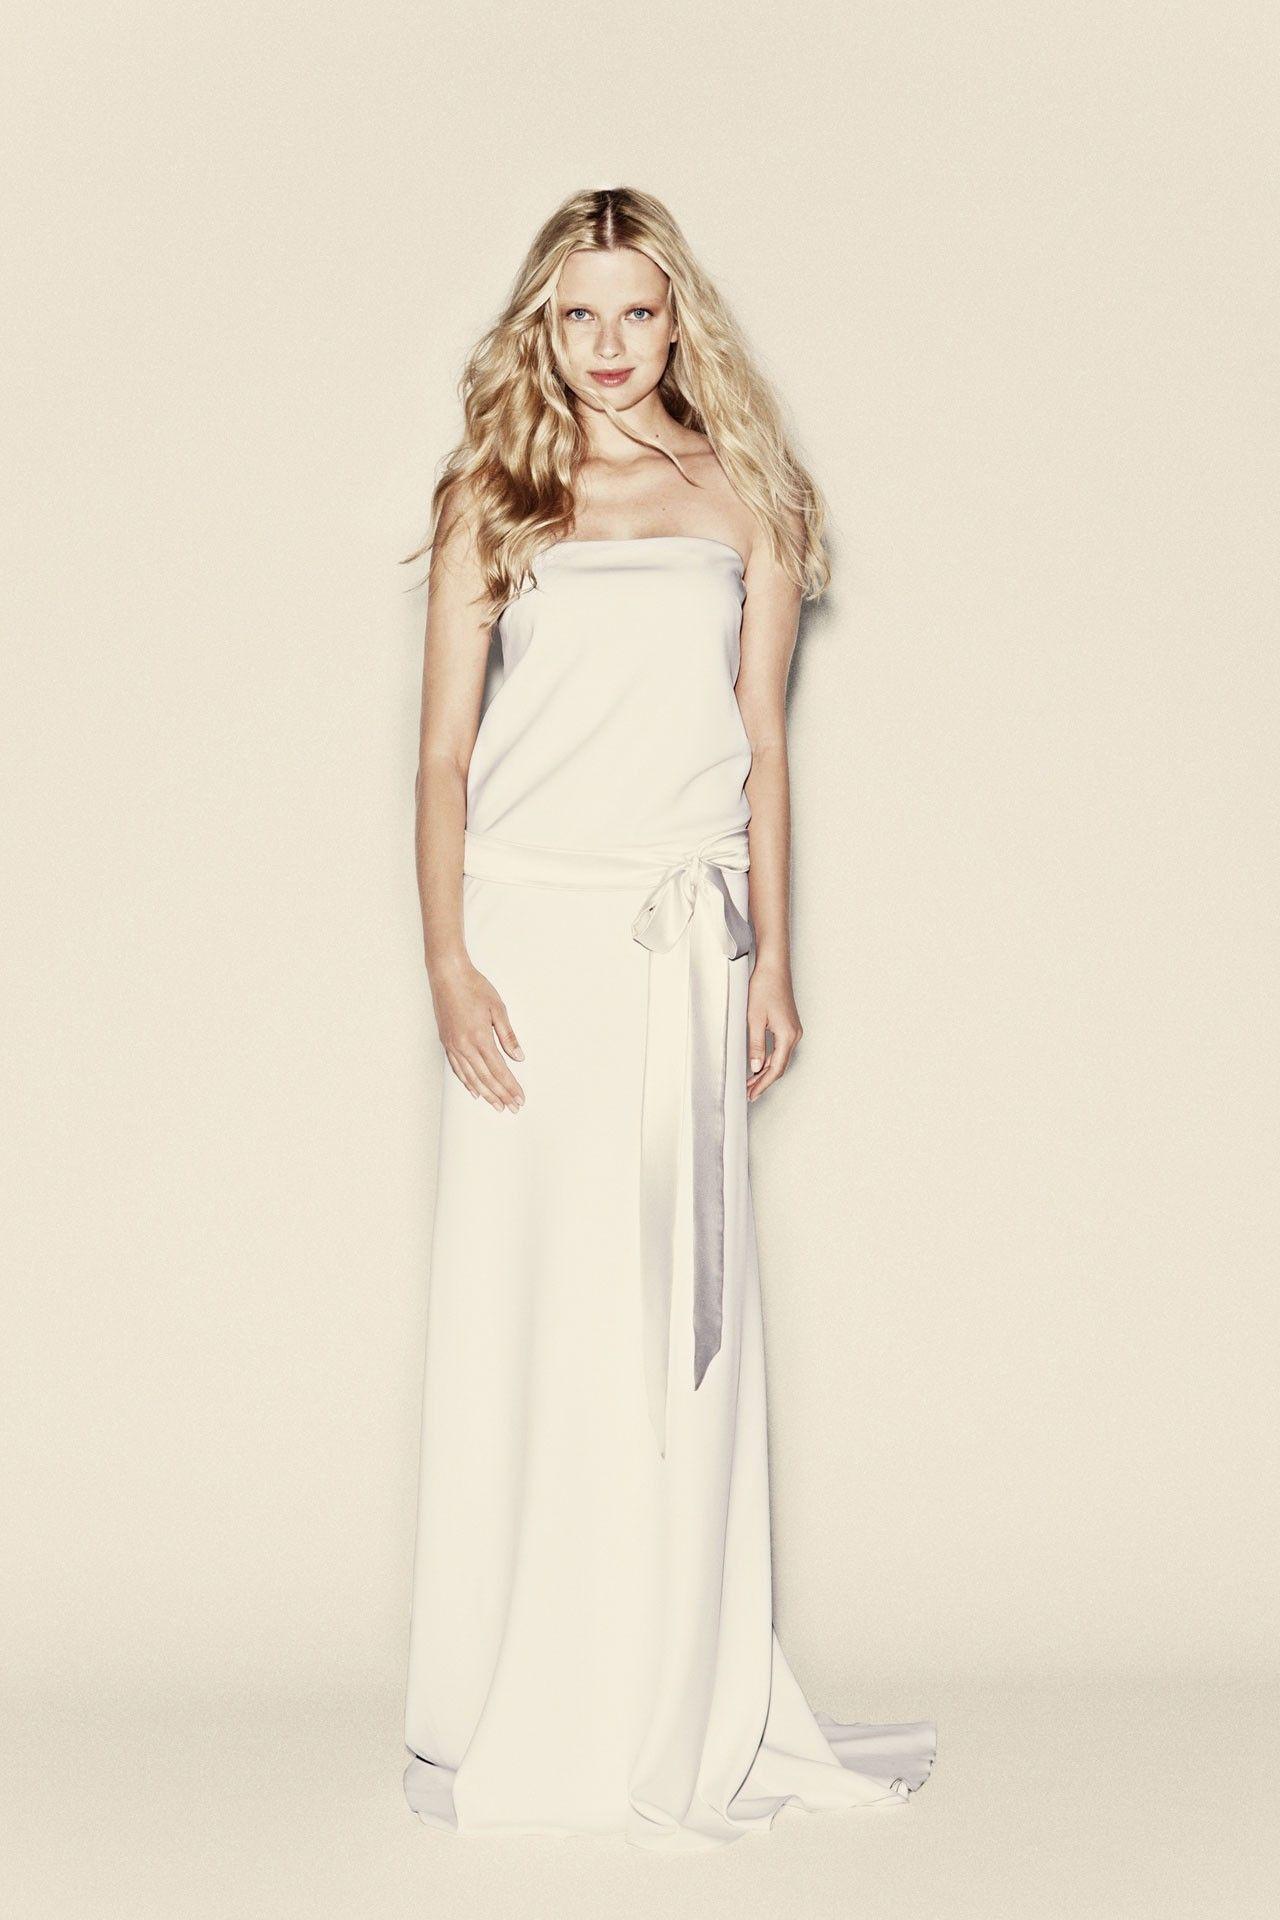 Wedding Dresses - The Ultimate Gallery (BridesMagazine.co.uk ... 74018a5664f